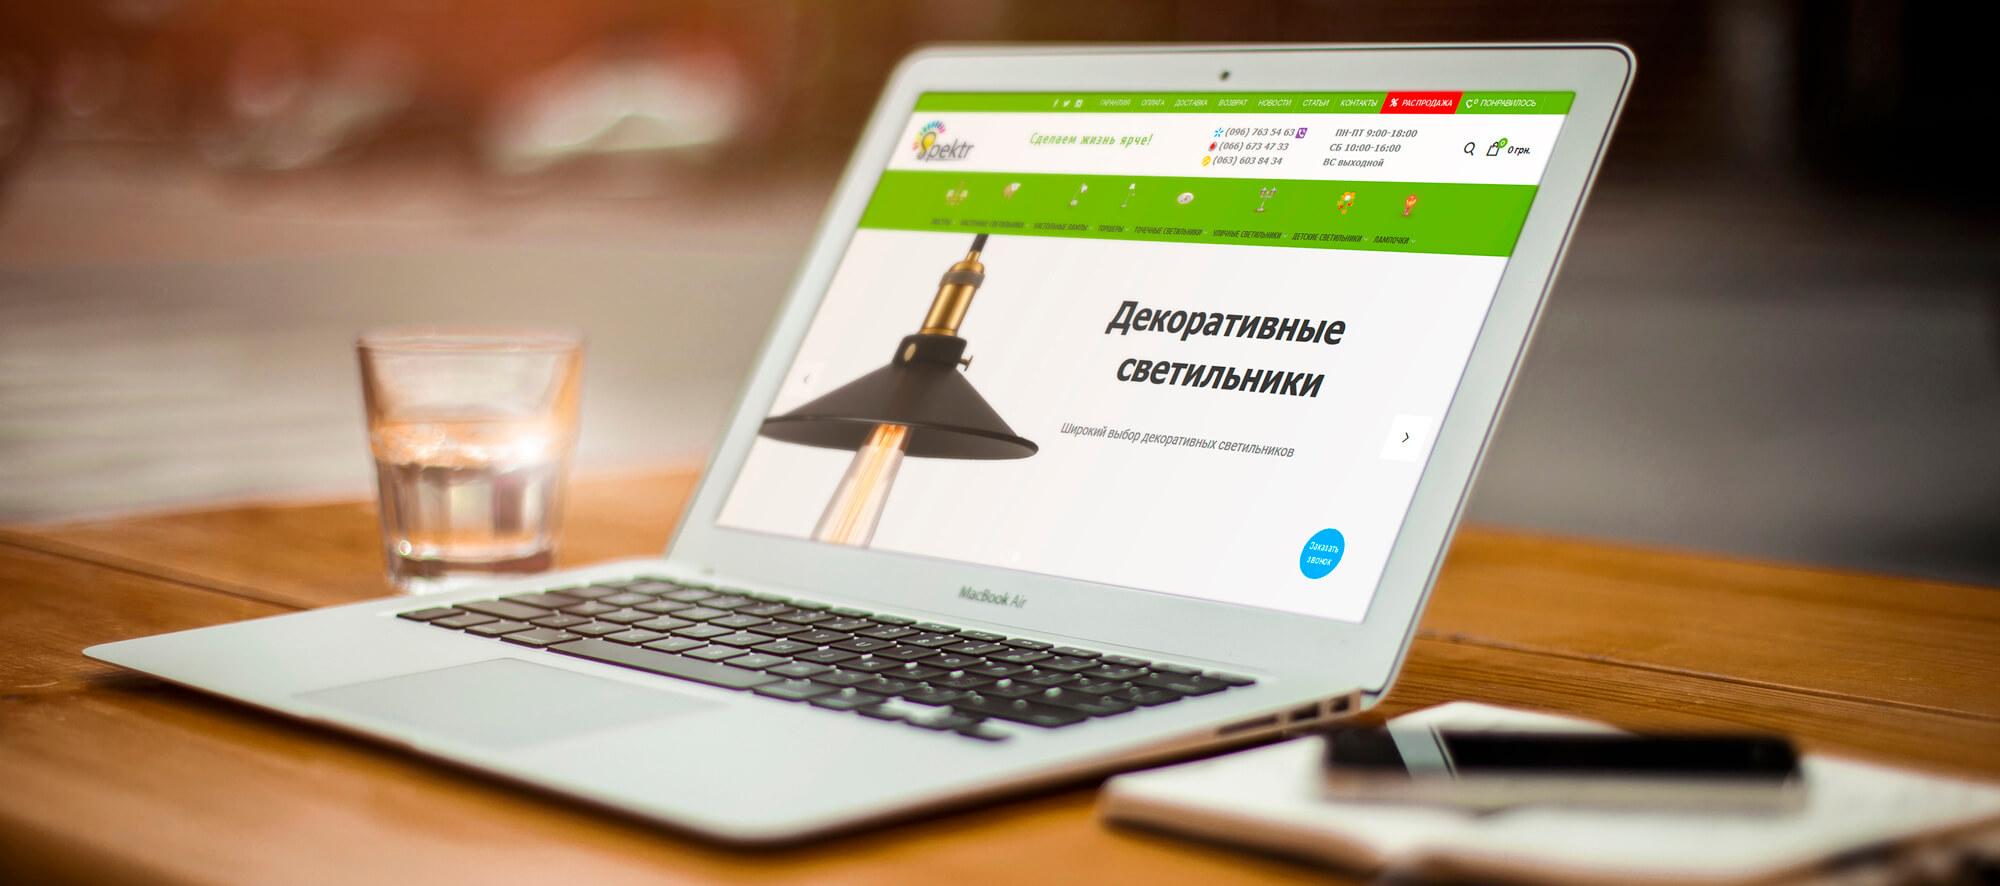 Создание интернет магазина. Разработка интернет магазинов. Интернет магазин.